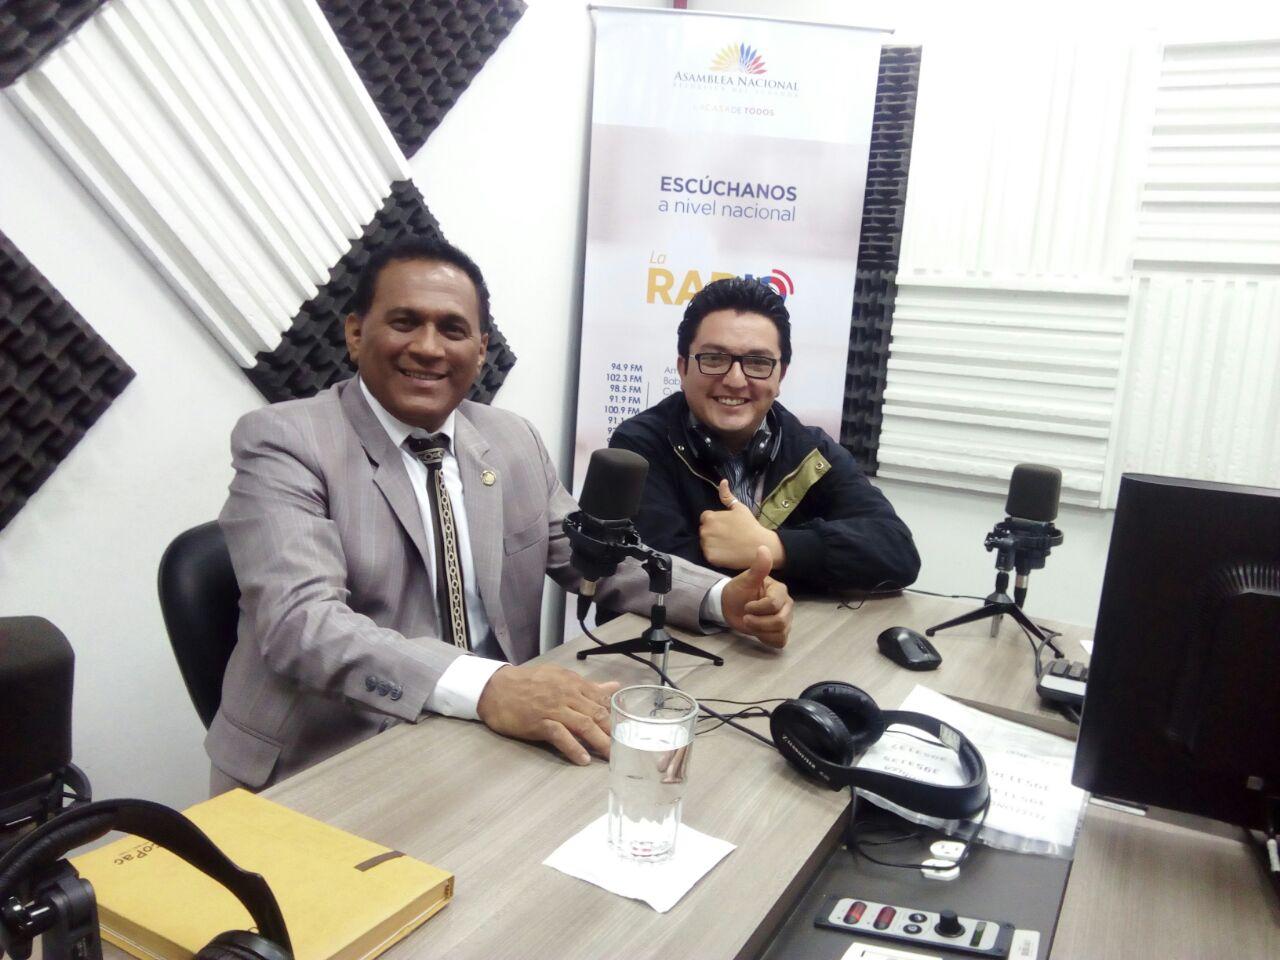 Manuel Ochoa: El asambleísta del pueblo